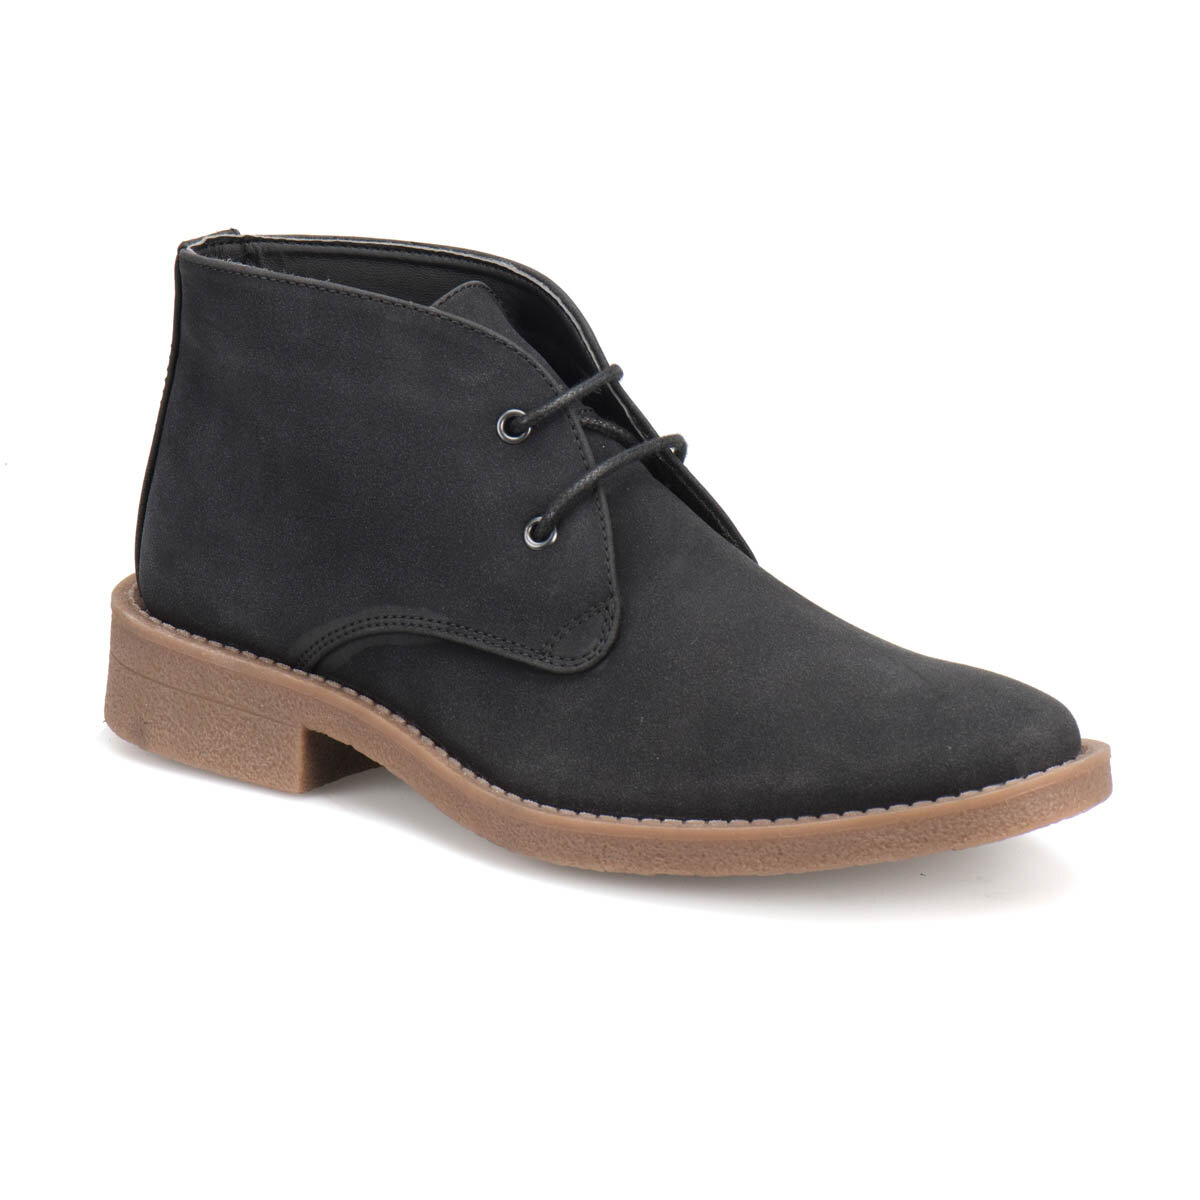 FLO 22940 Black Men Boots Garamond